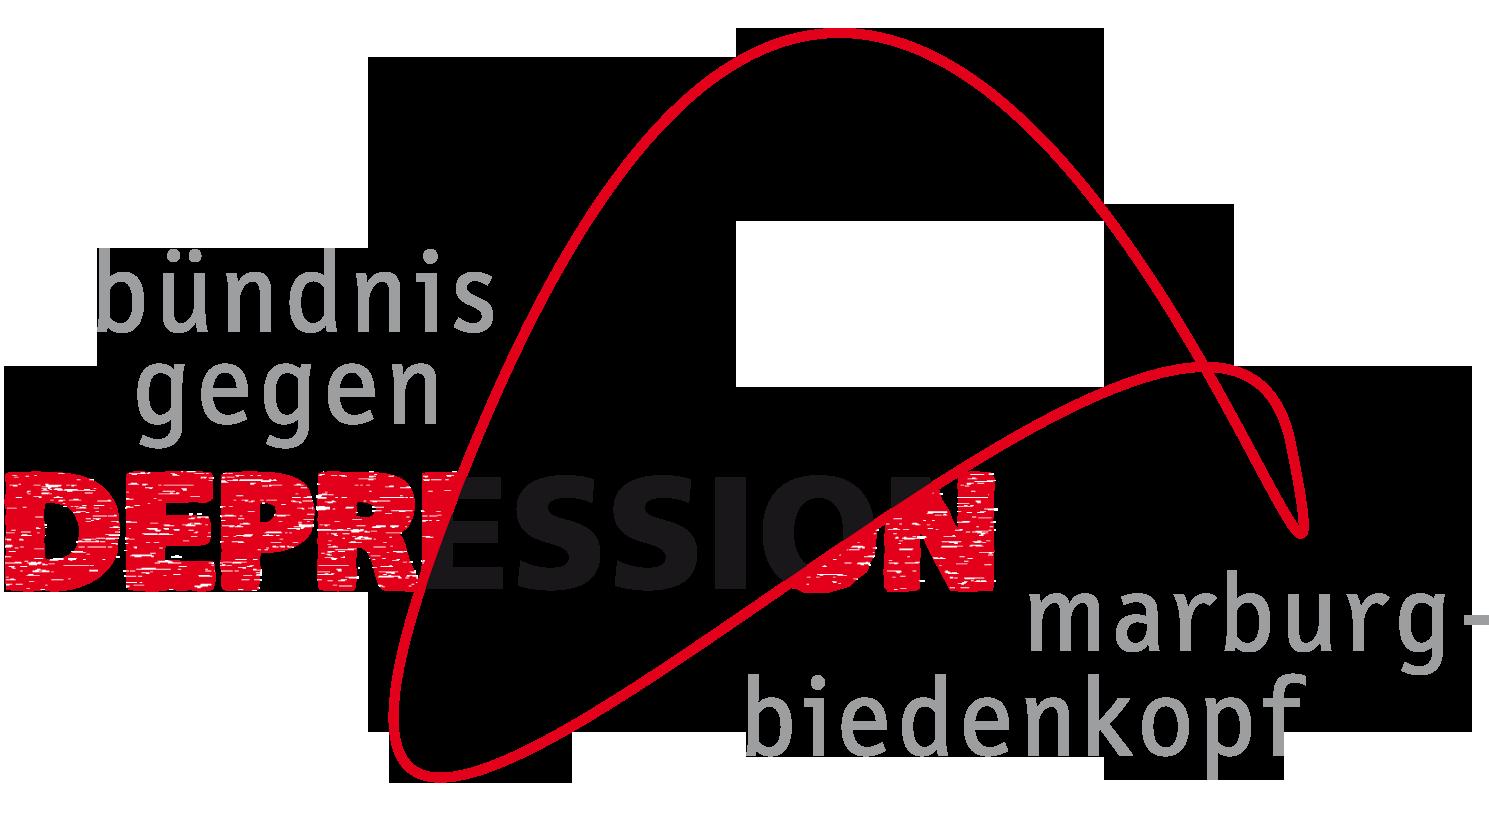 Bündnis gegen Depression Marburg-Biedenkopf e.V.